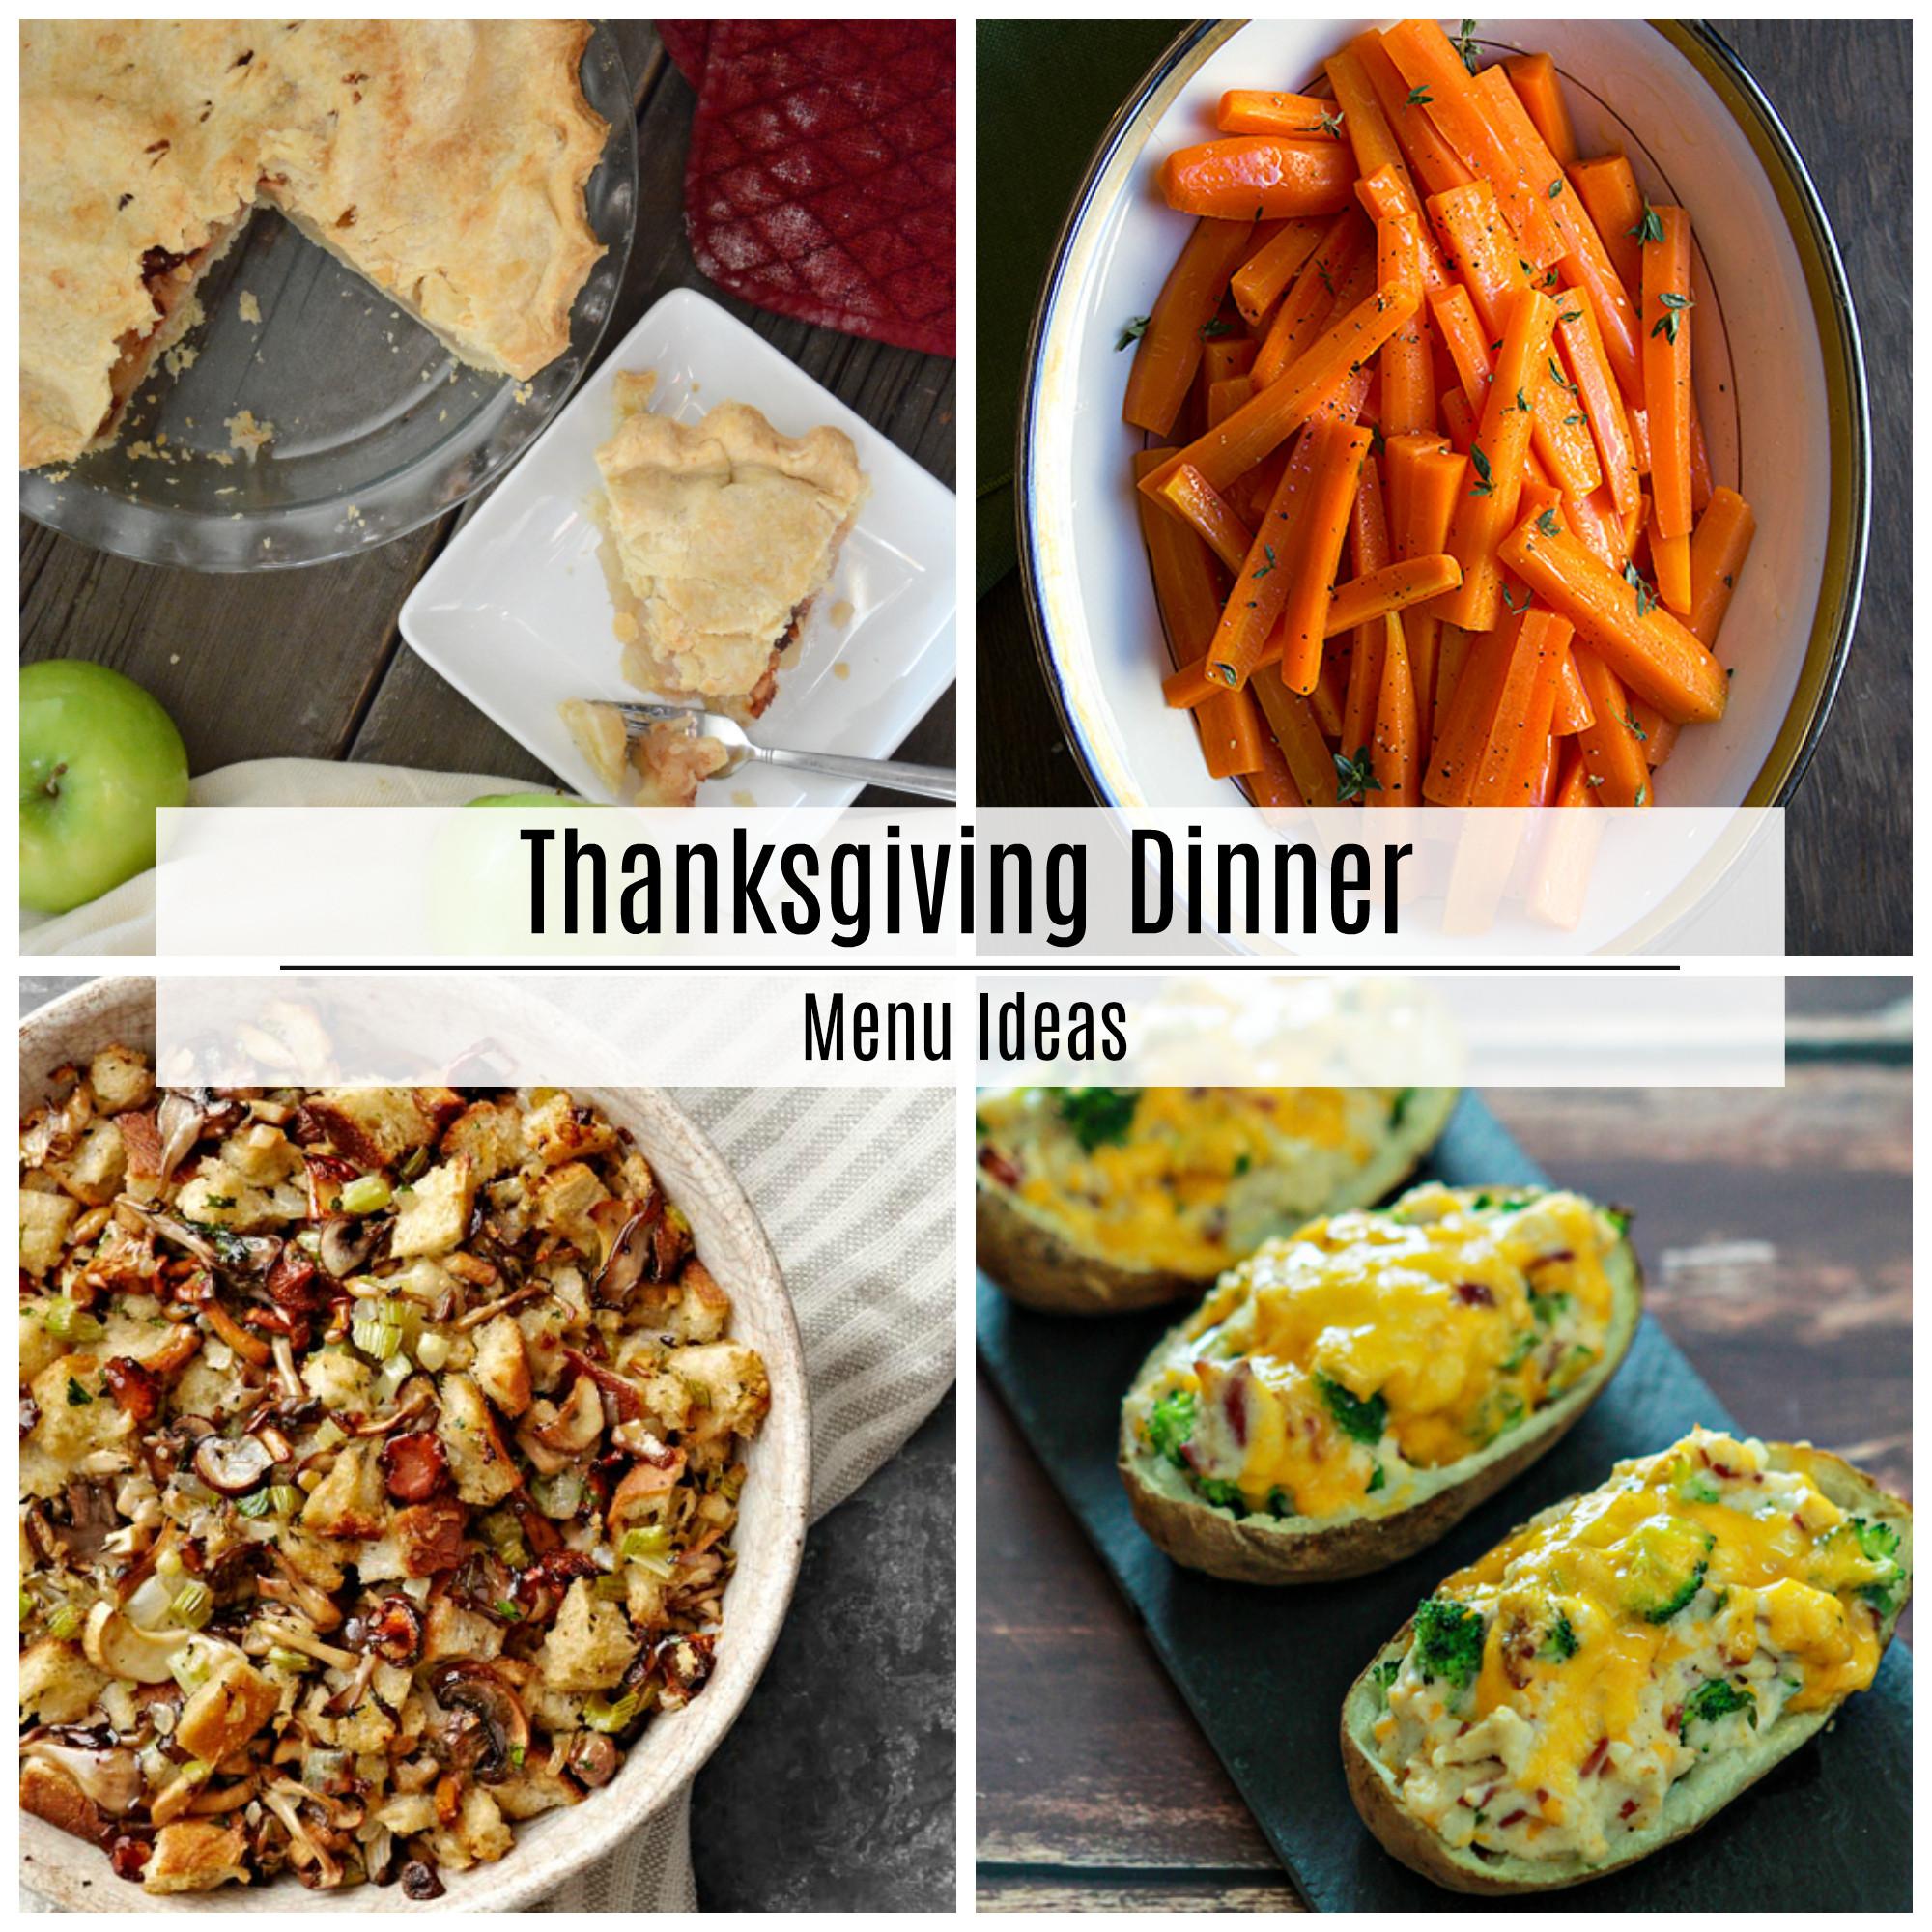 Thanksgiving Dinner Menu Ideas  Thanksgiving Dinner Menu Recipe Ideas The Idea Room